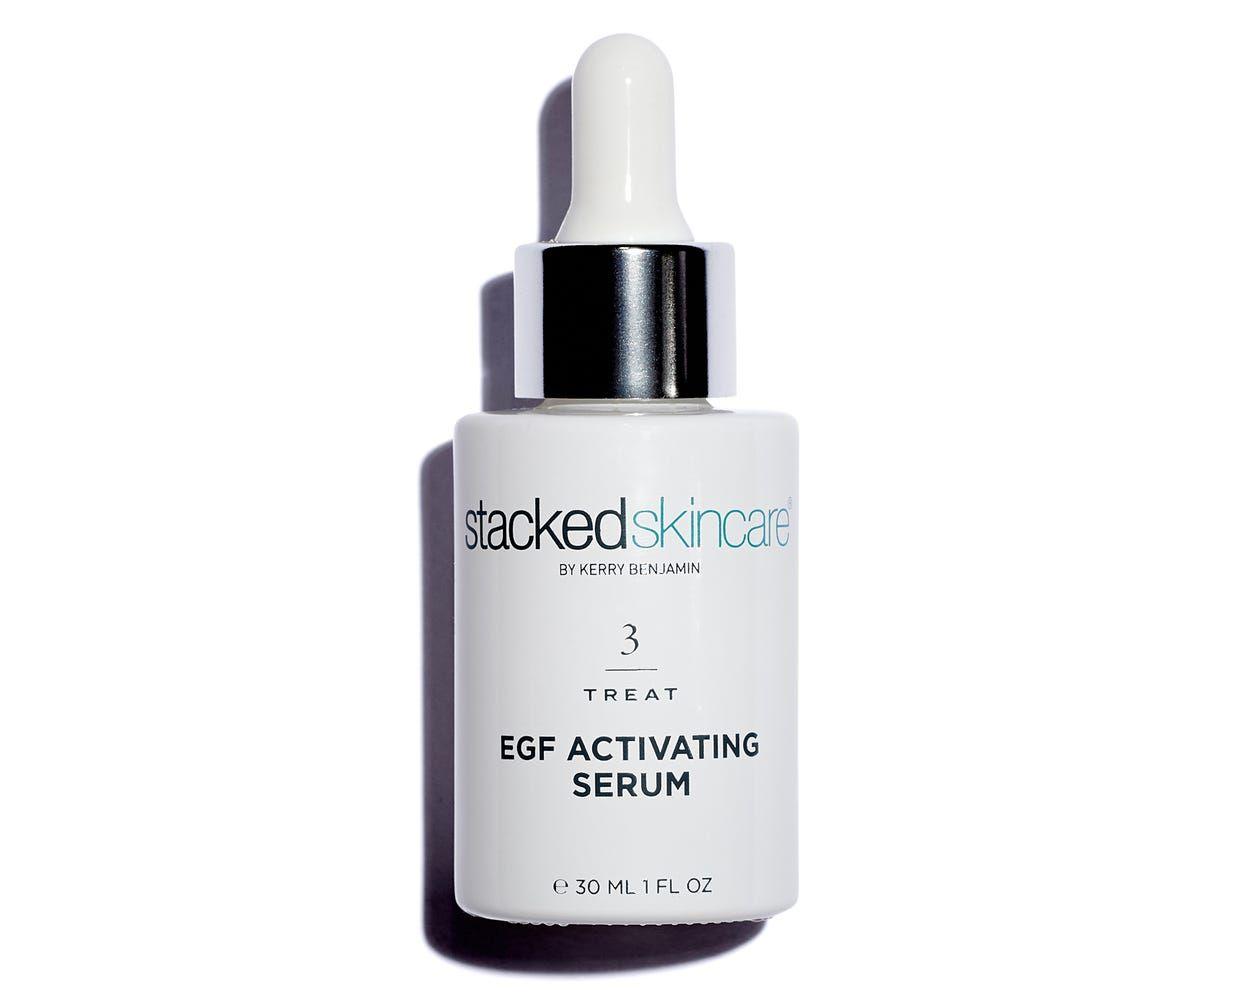 Stacked Skincare EGF Activating Serum